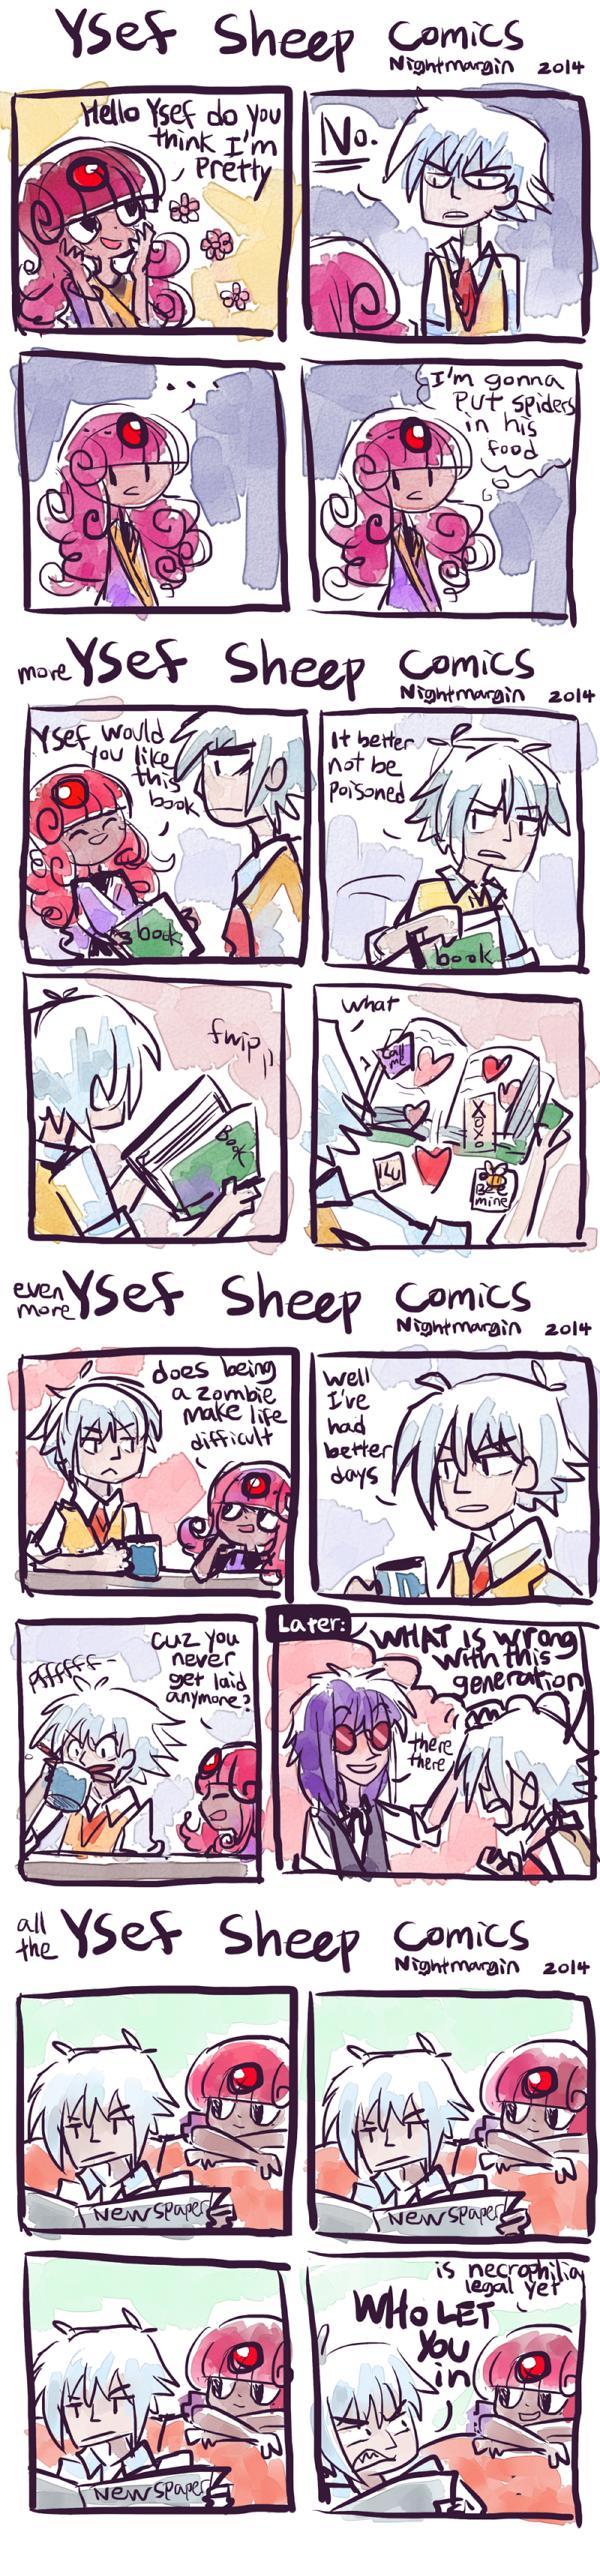 Ysef Sheep comics by NightMargin